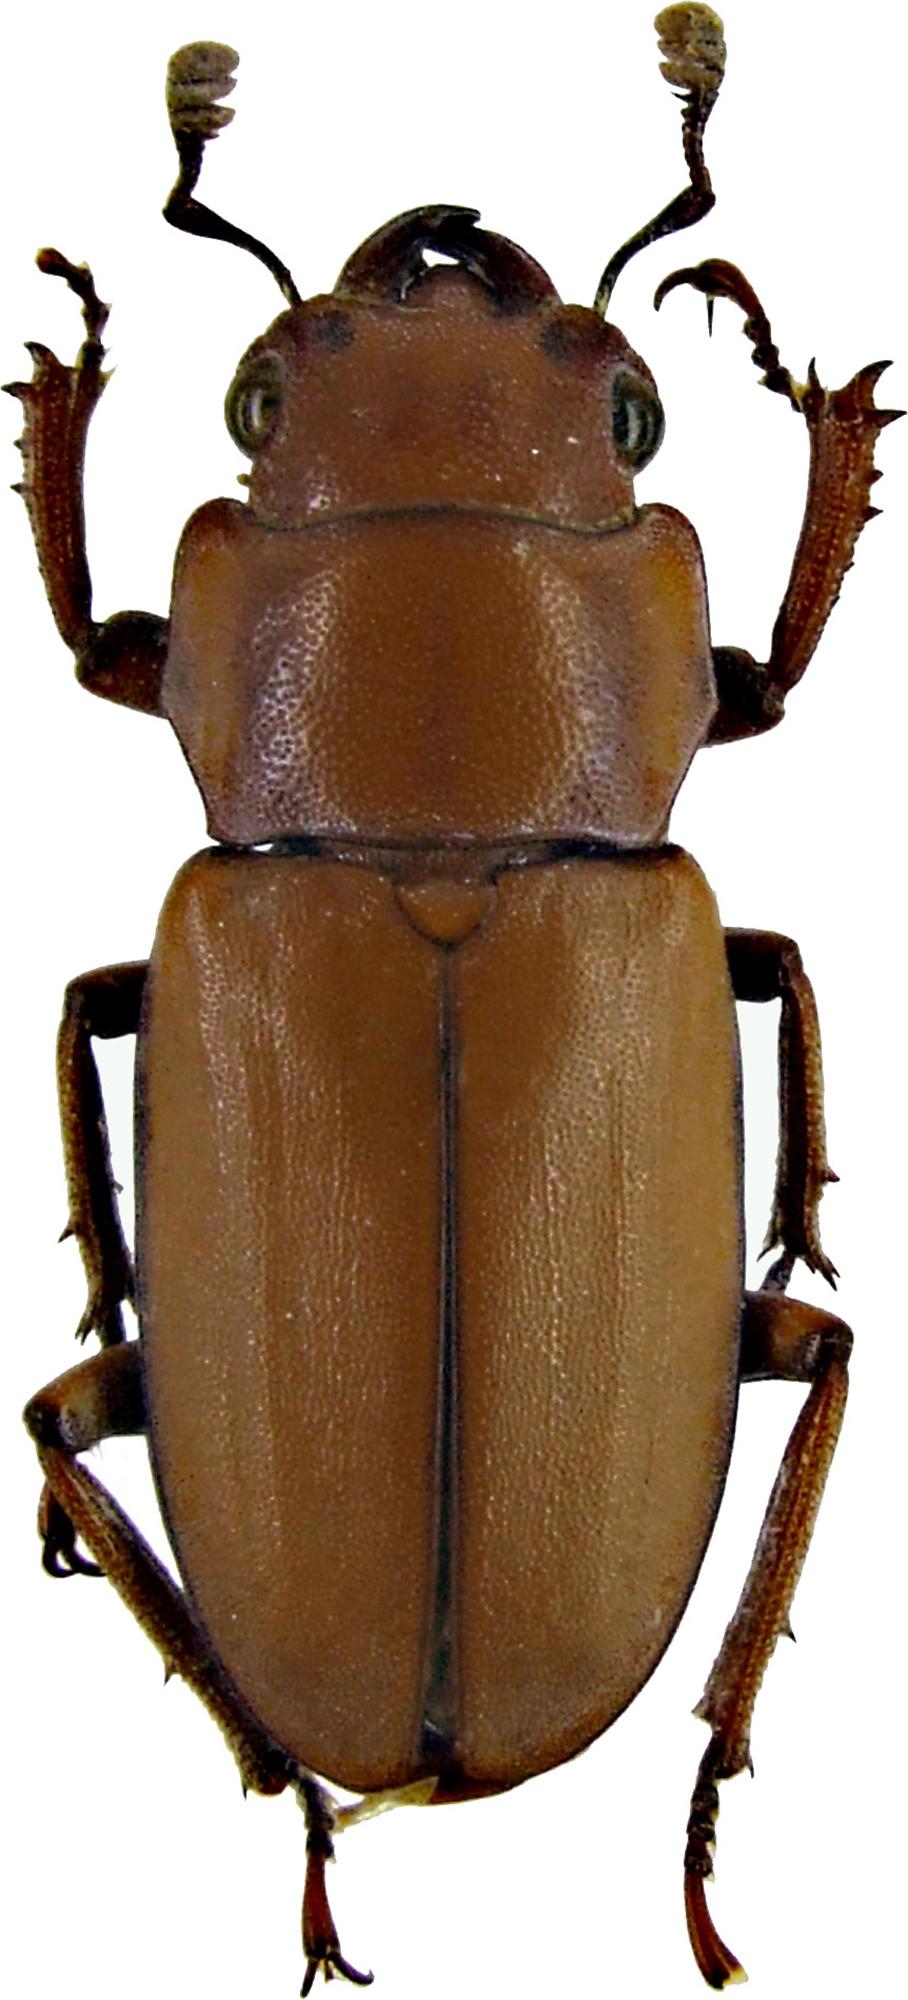 Cyclommatus lunifer 1226.jpg